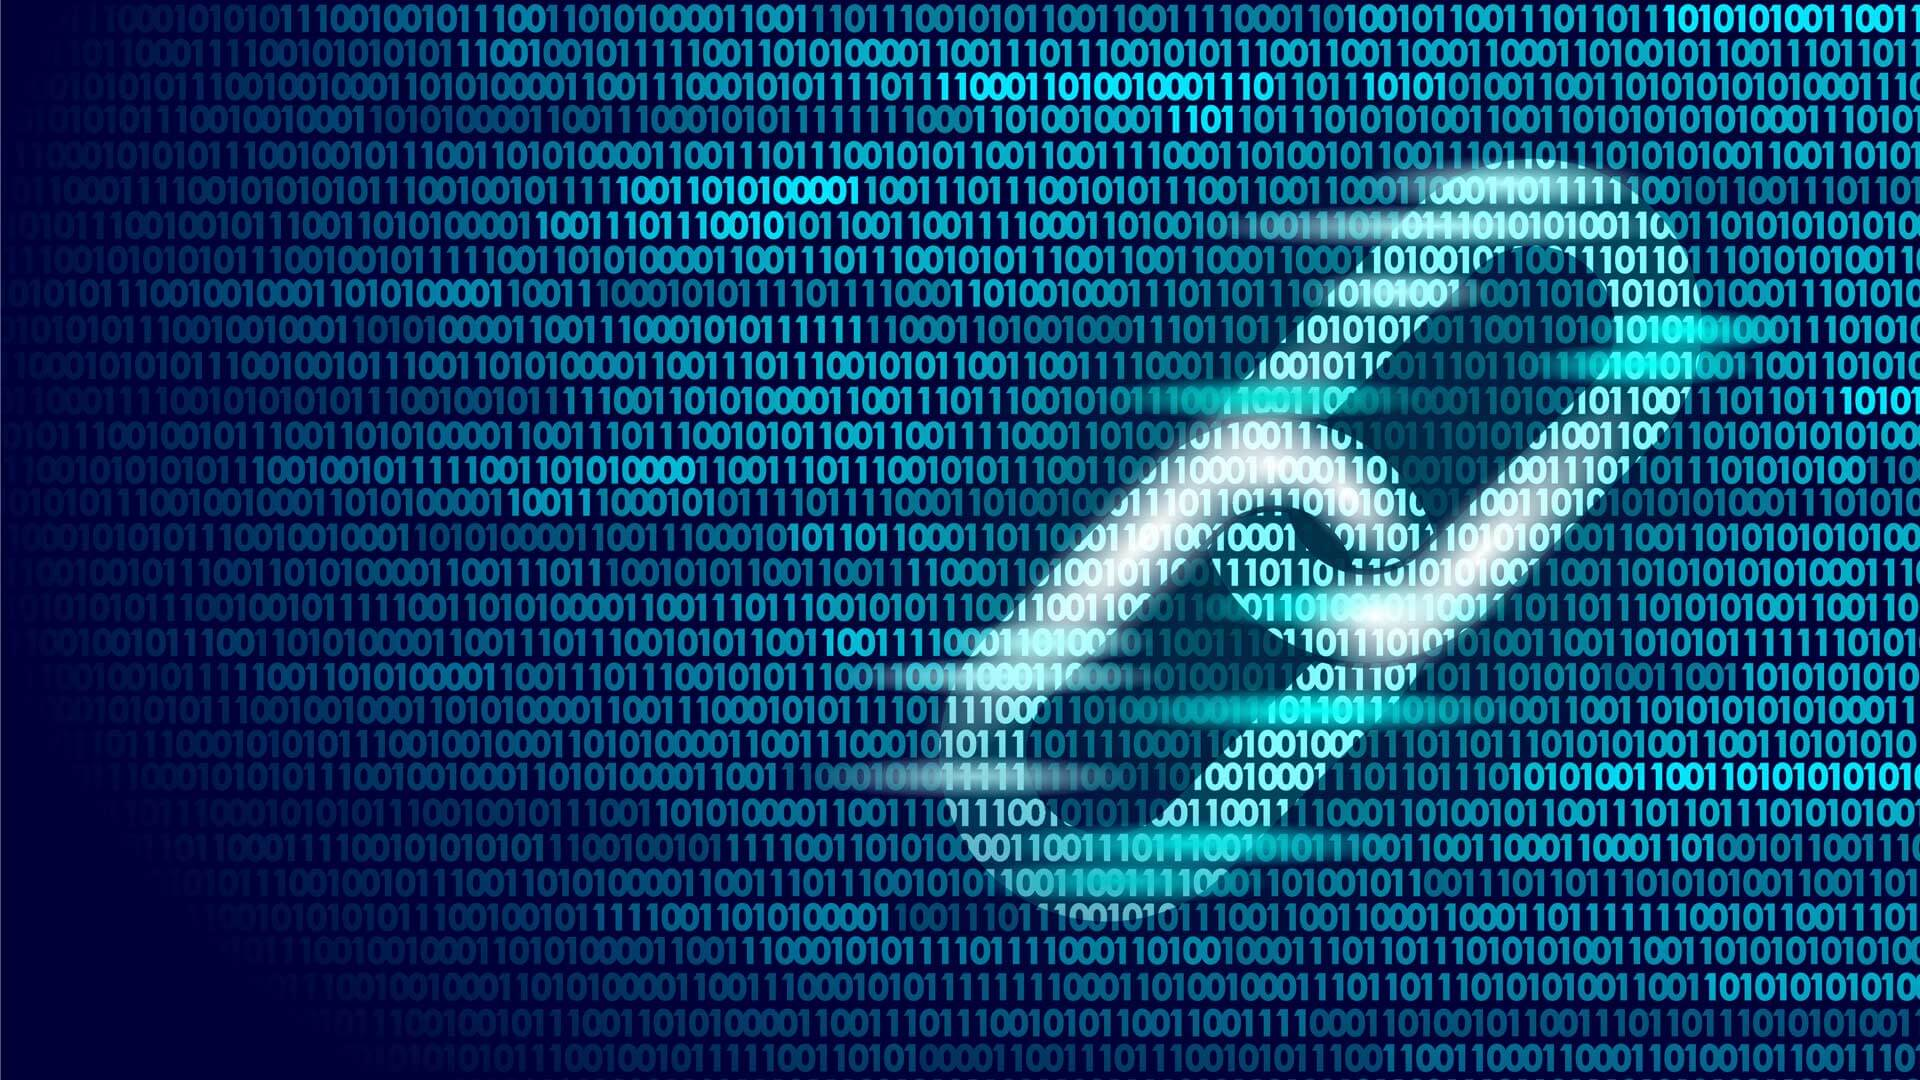 Le start up blockchain statunitensi lanciano Blockchain Association - Le start-up blockchain statunitensi lanciano la Blockchain Association ufficiale USA